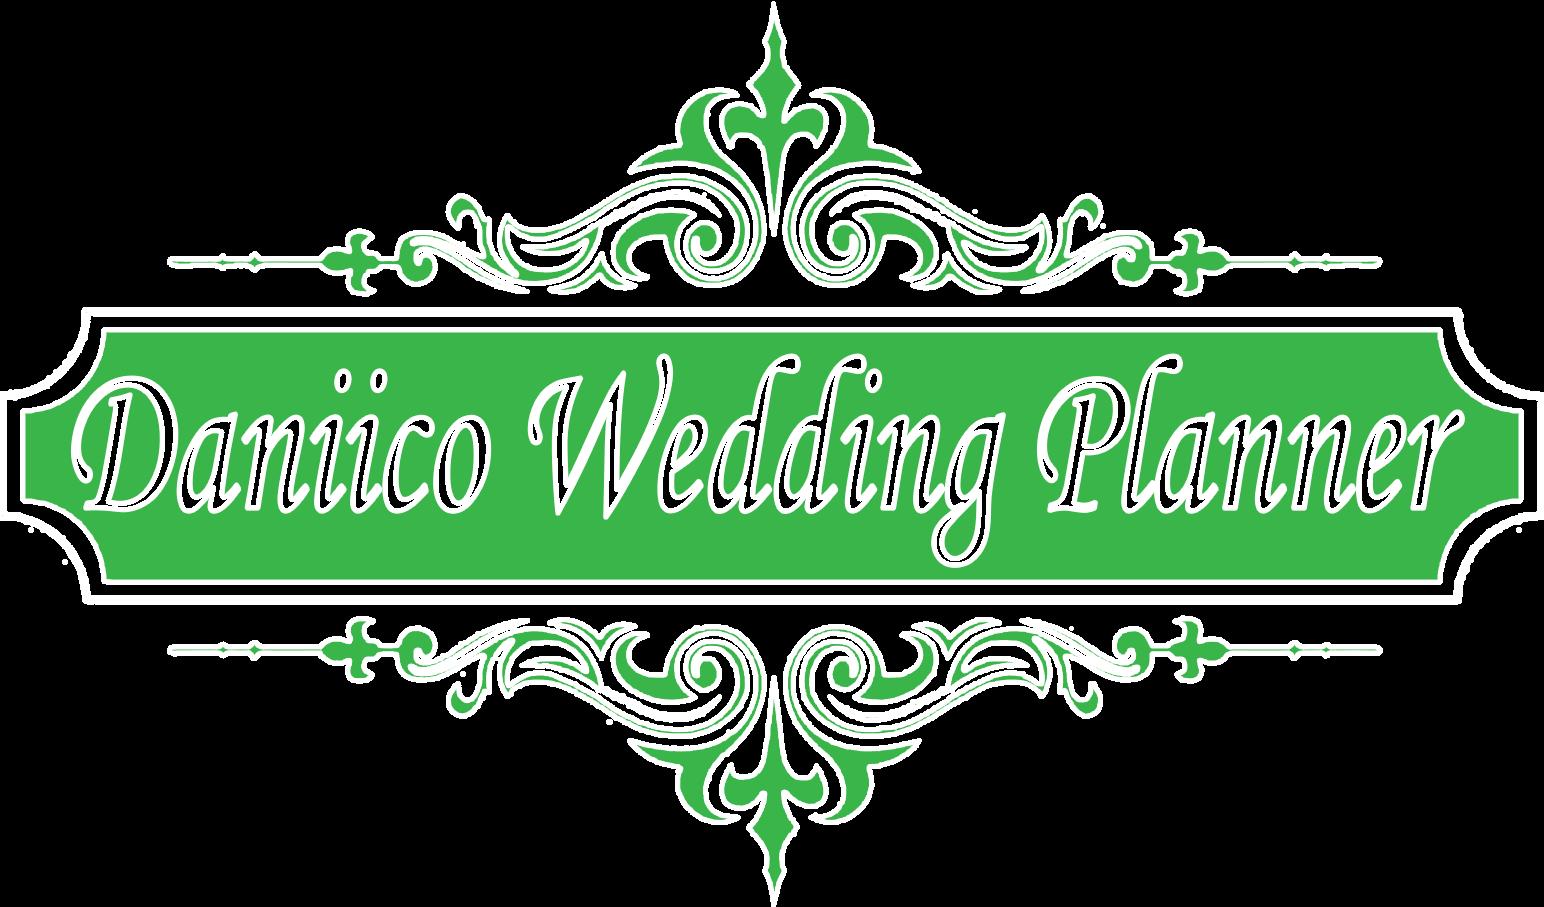 Paket Pernikahan | Daniico Wedding Planner Semarang